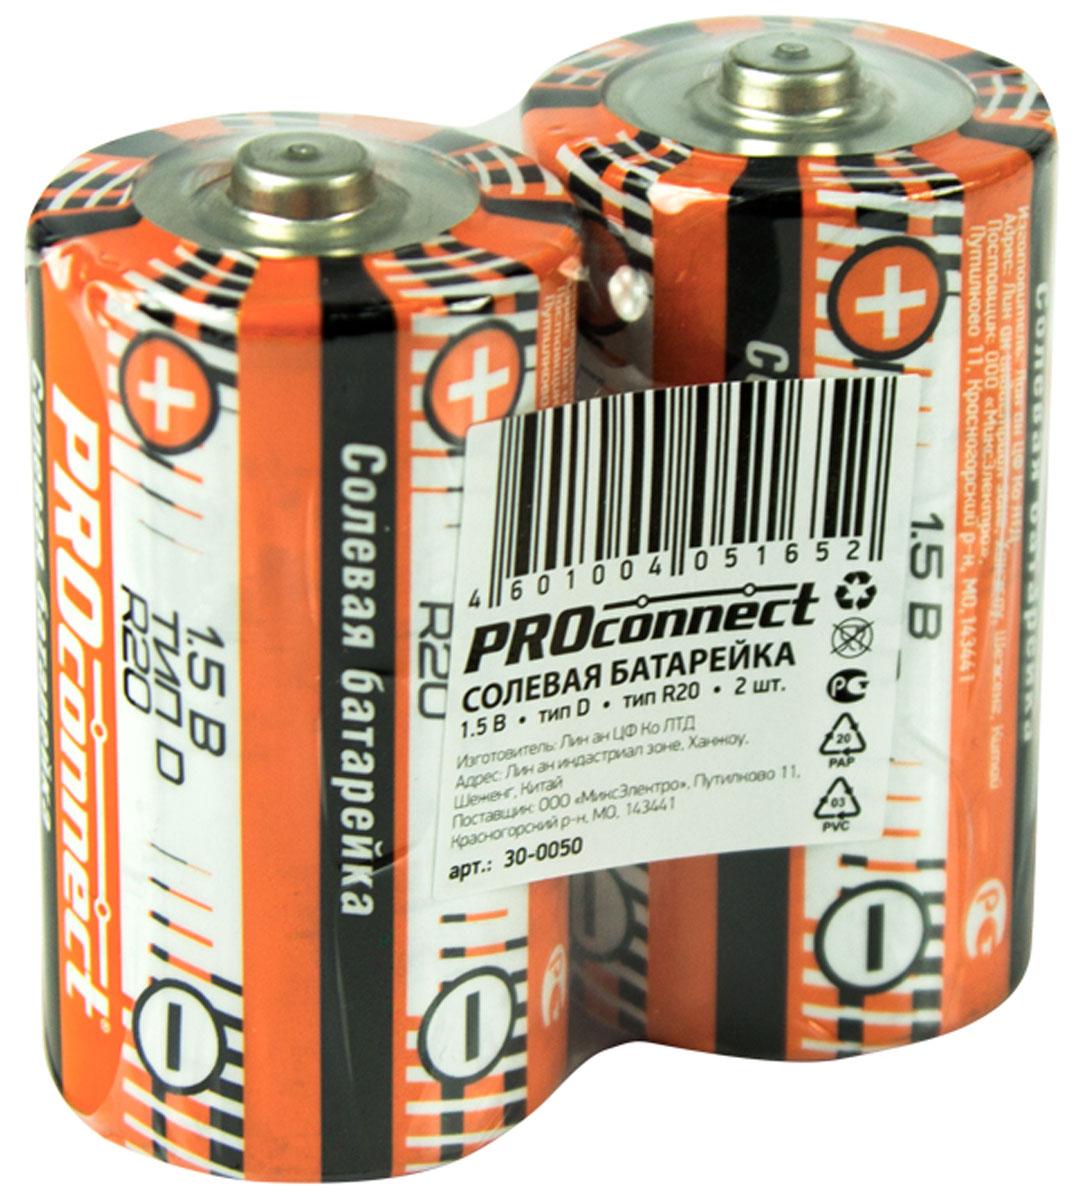 Батарейка солевая PROconnect, тип D-R20, 2 шт батарейка d minamoto 1 5v r20 sr2 2 штуки